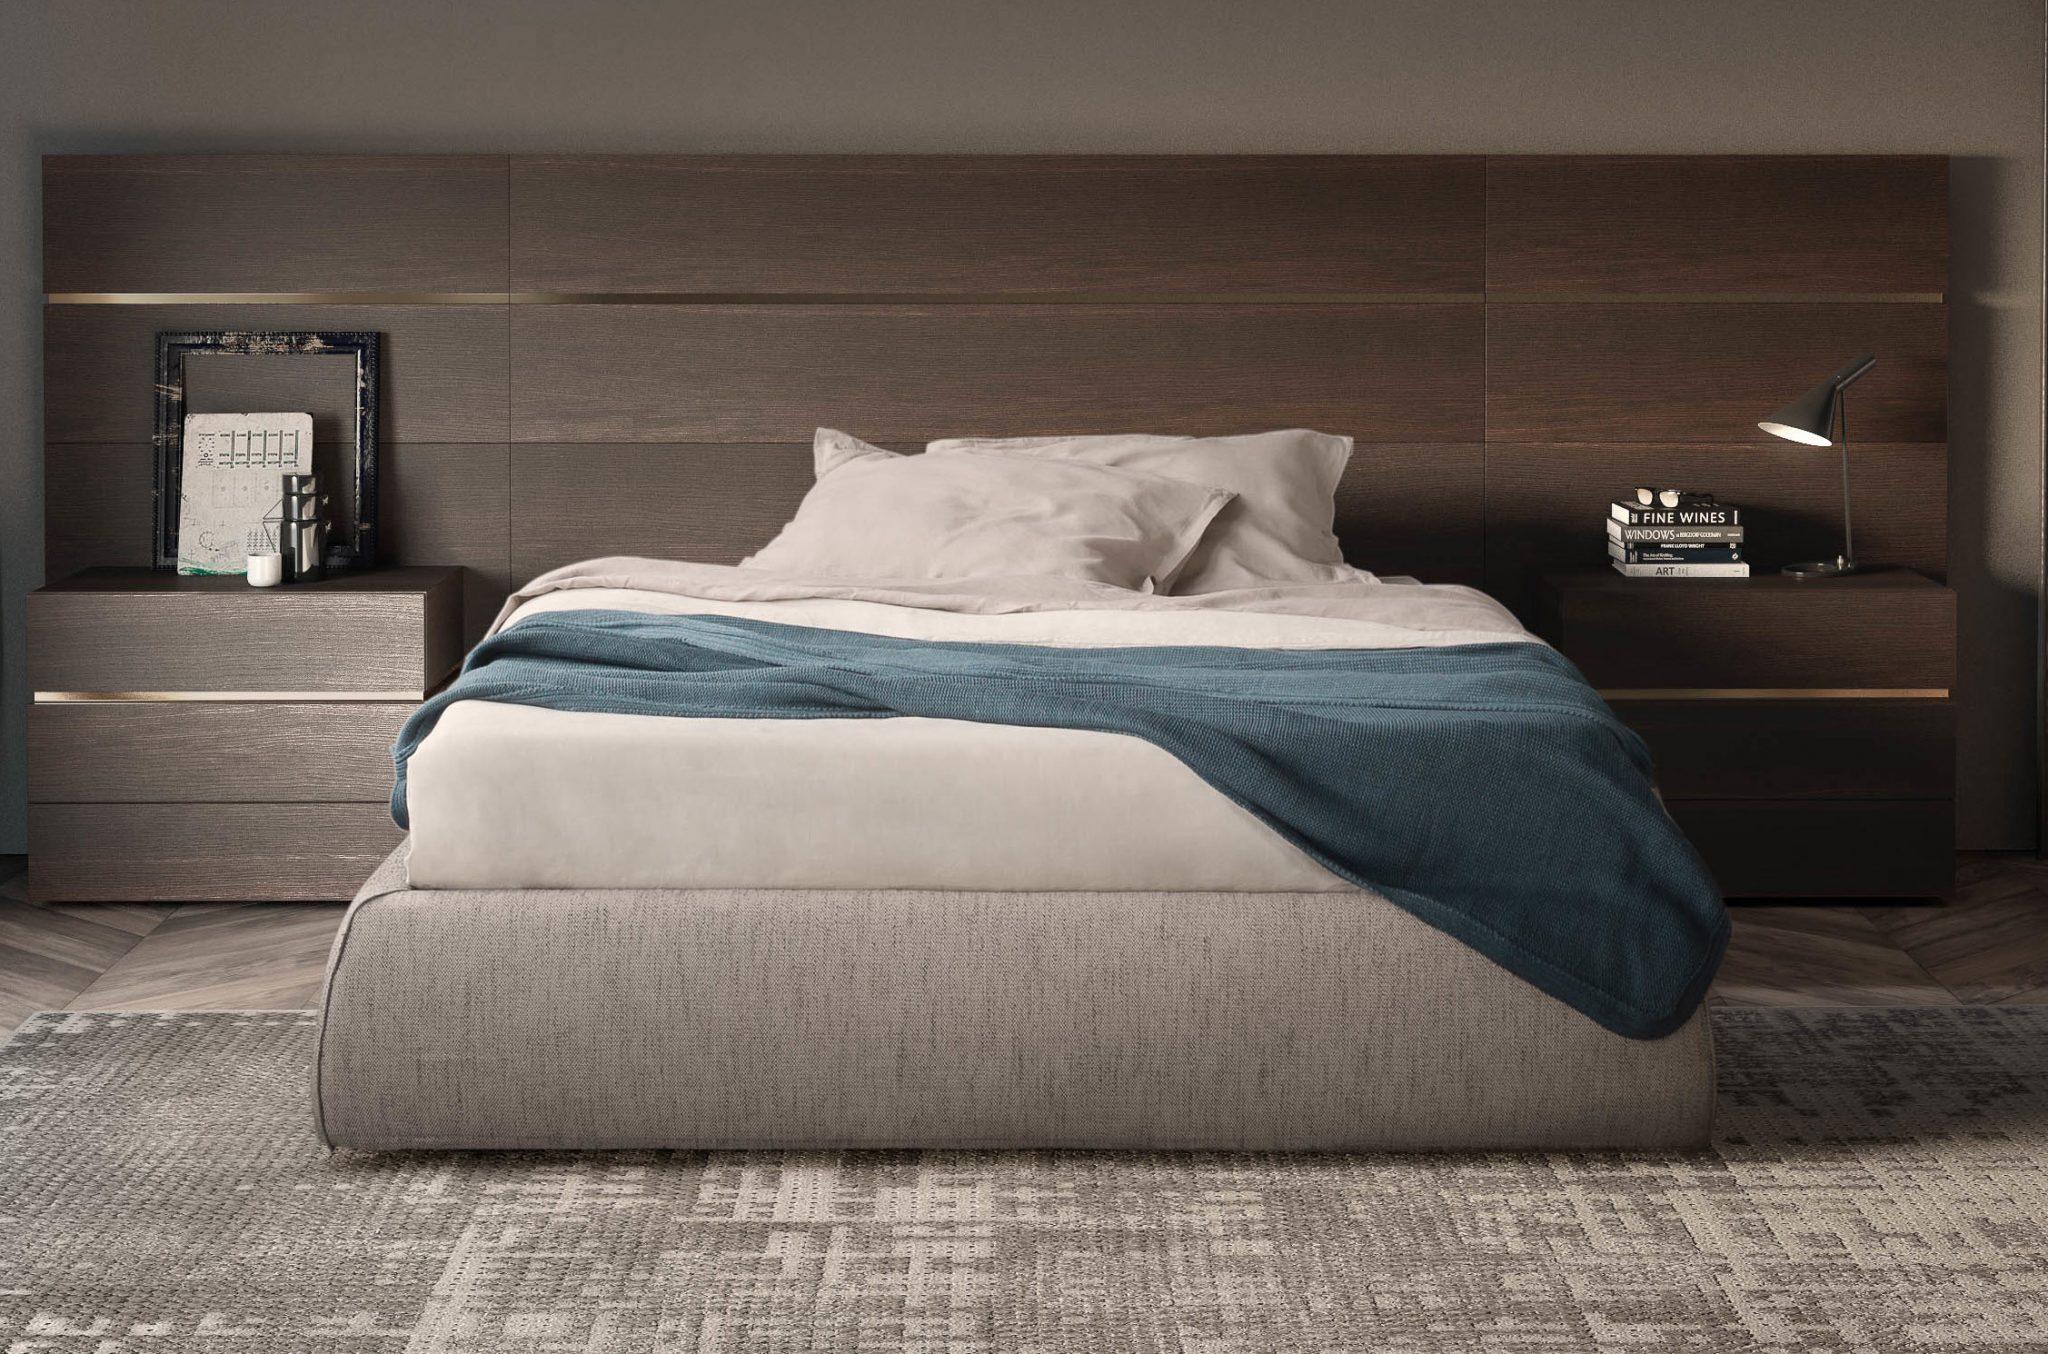 Man Made Bed 2048x1354